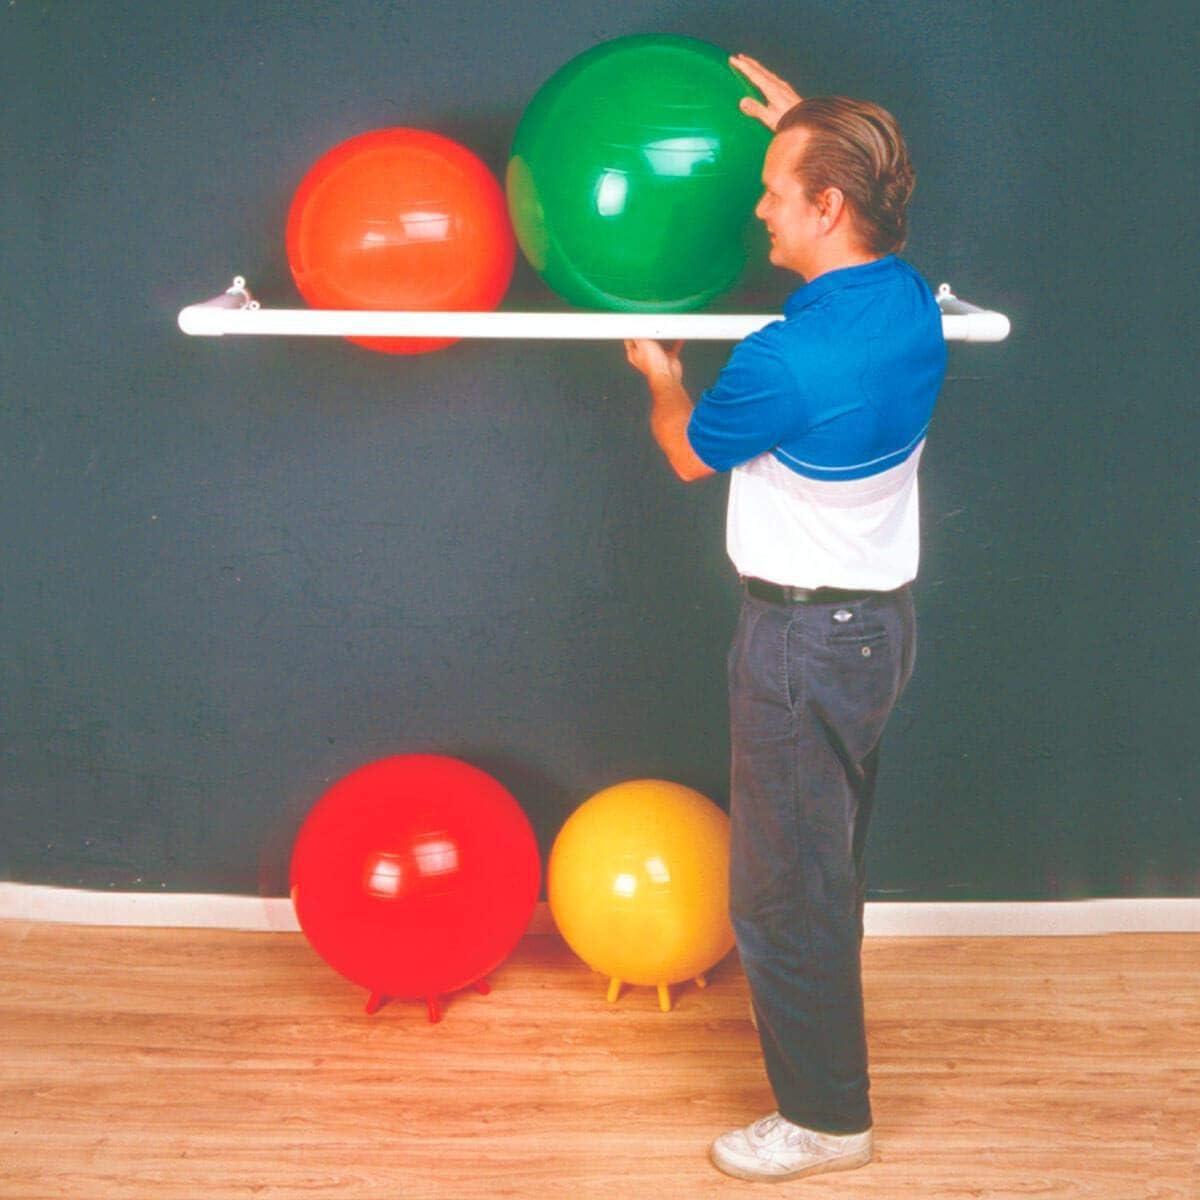 Ultra-Cheap Deals FAB301831 - Wall rack 3 ball ba capacity for molded inflatable Las Vegas Mall